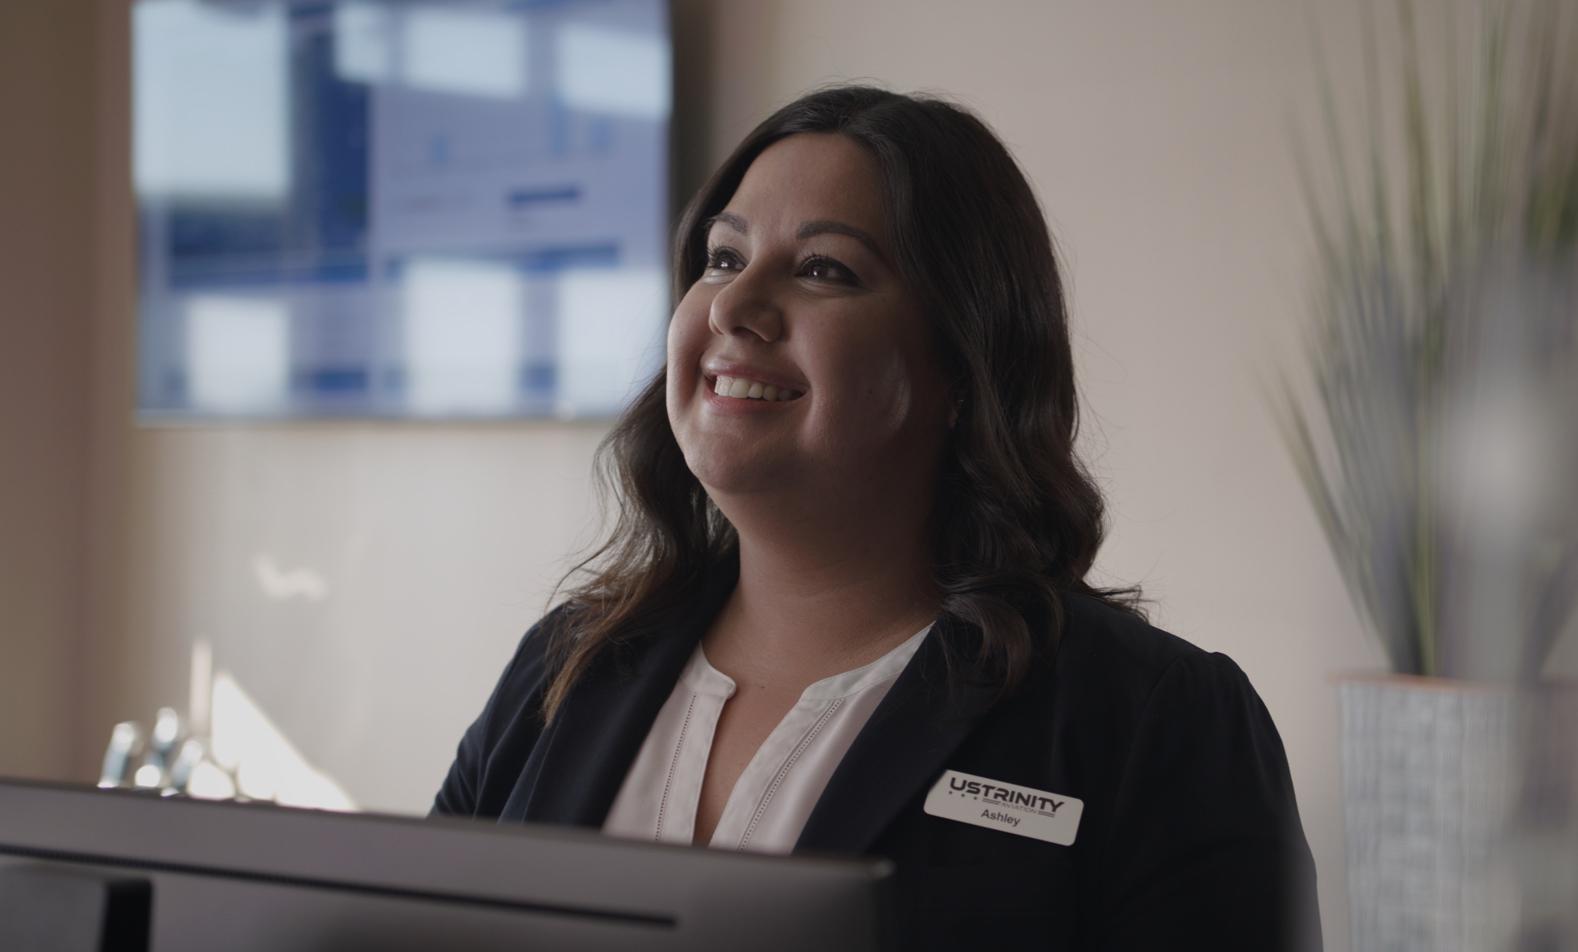 Representative smiling at service desk